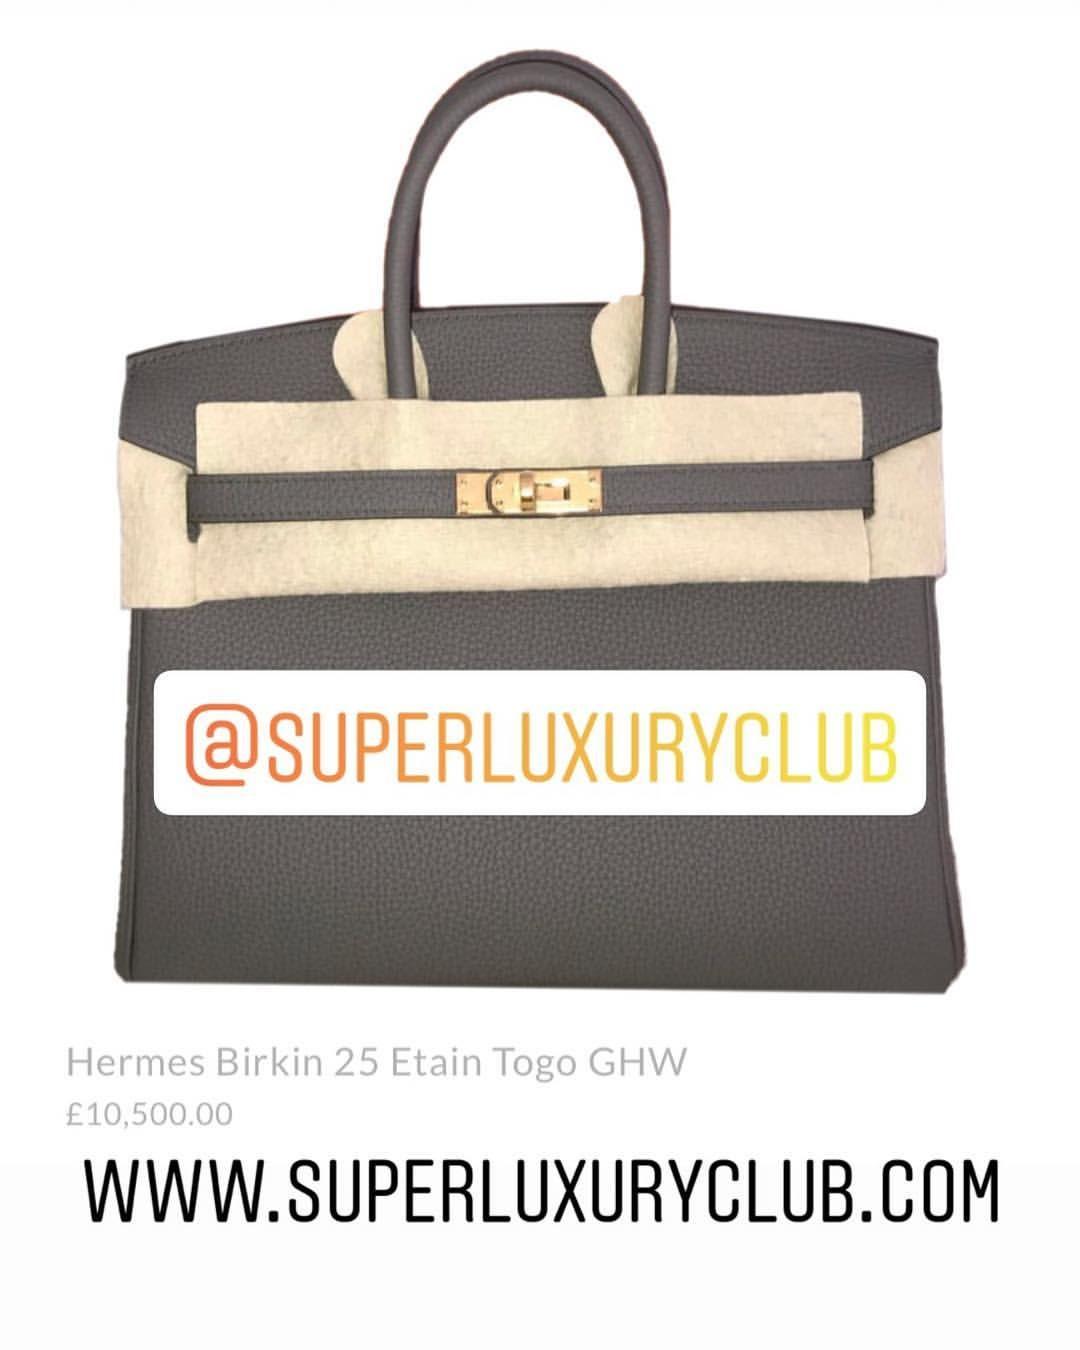 bc0b6222c17 Authentic Hermes handbags •Available •guarantee money back •worldwide  shipping •info superluxuryclub.com